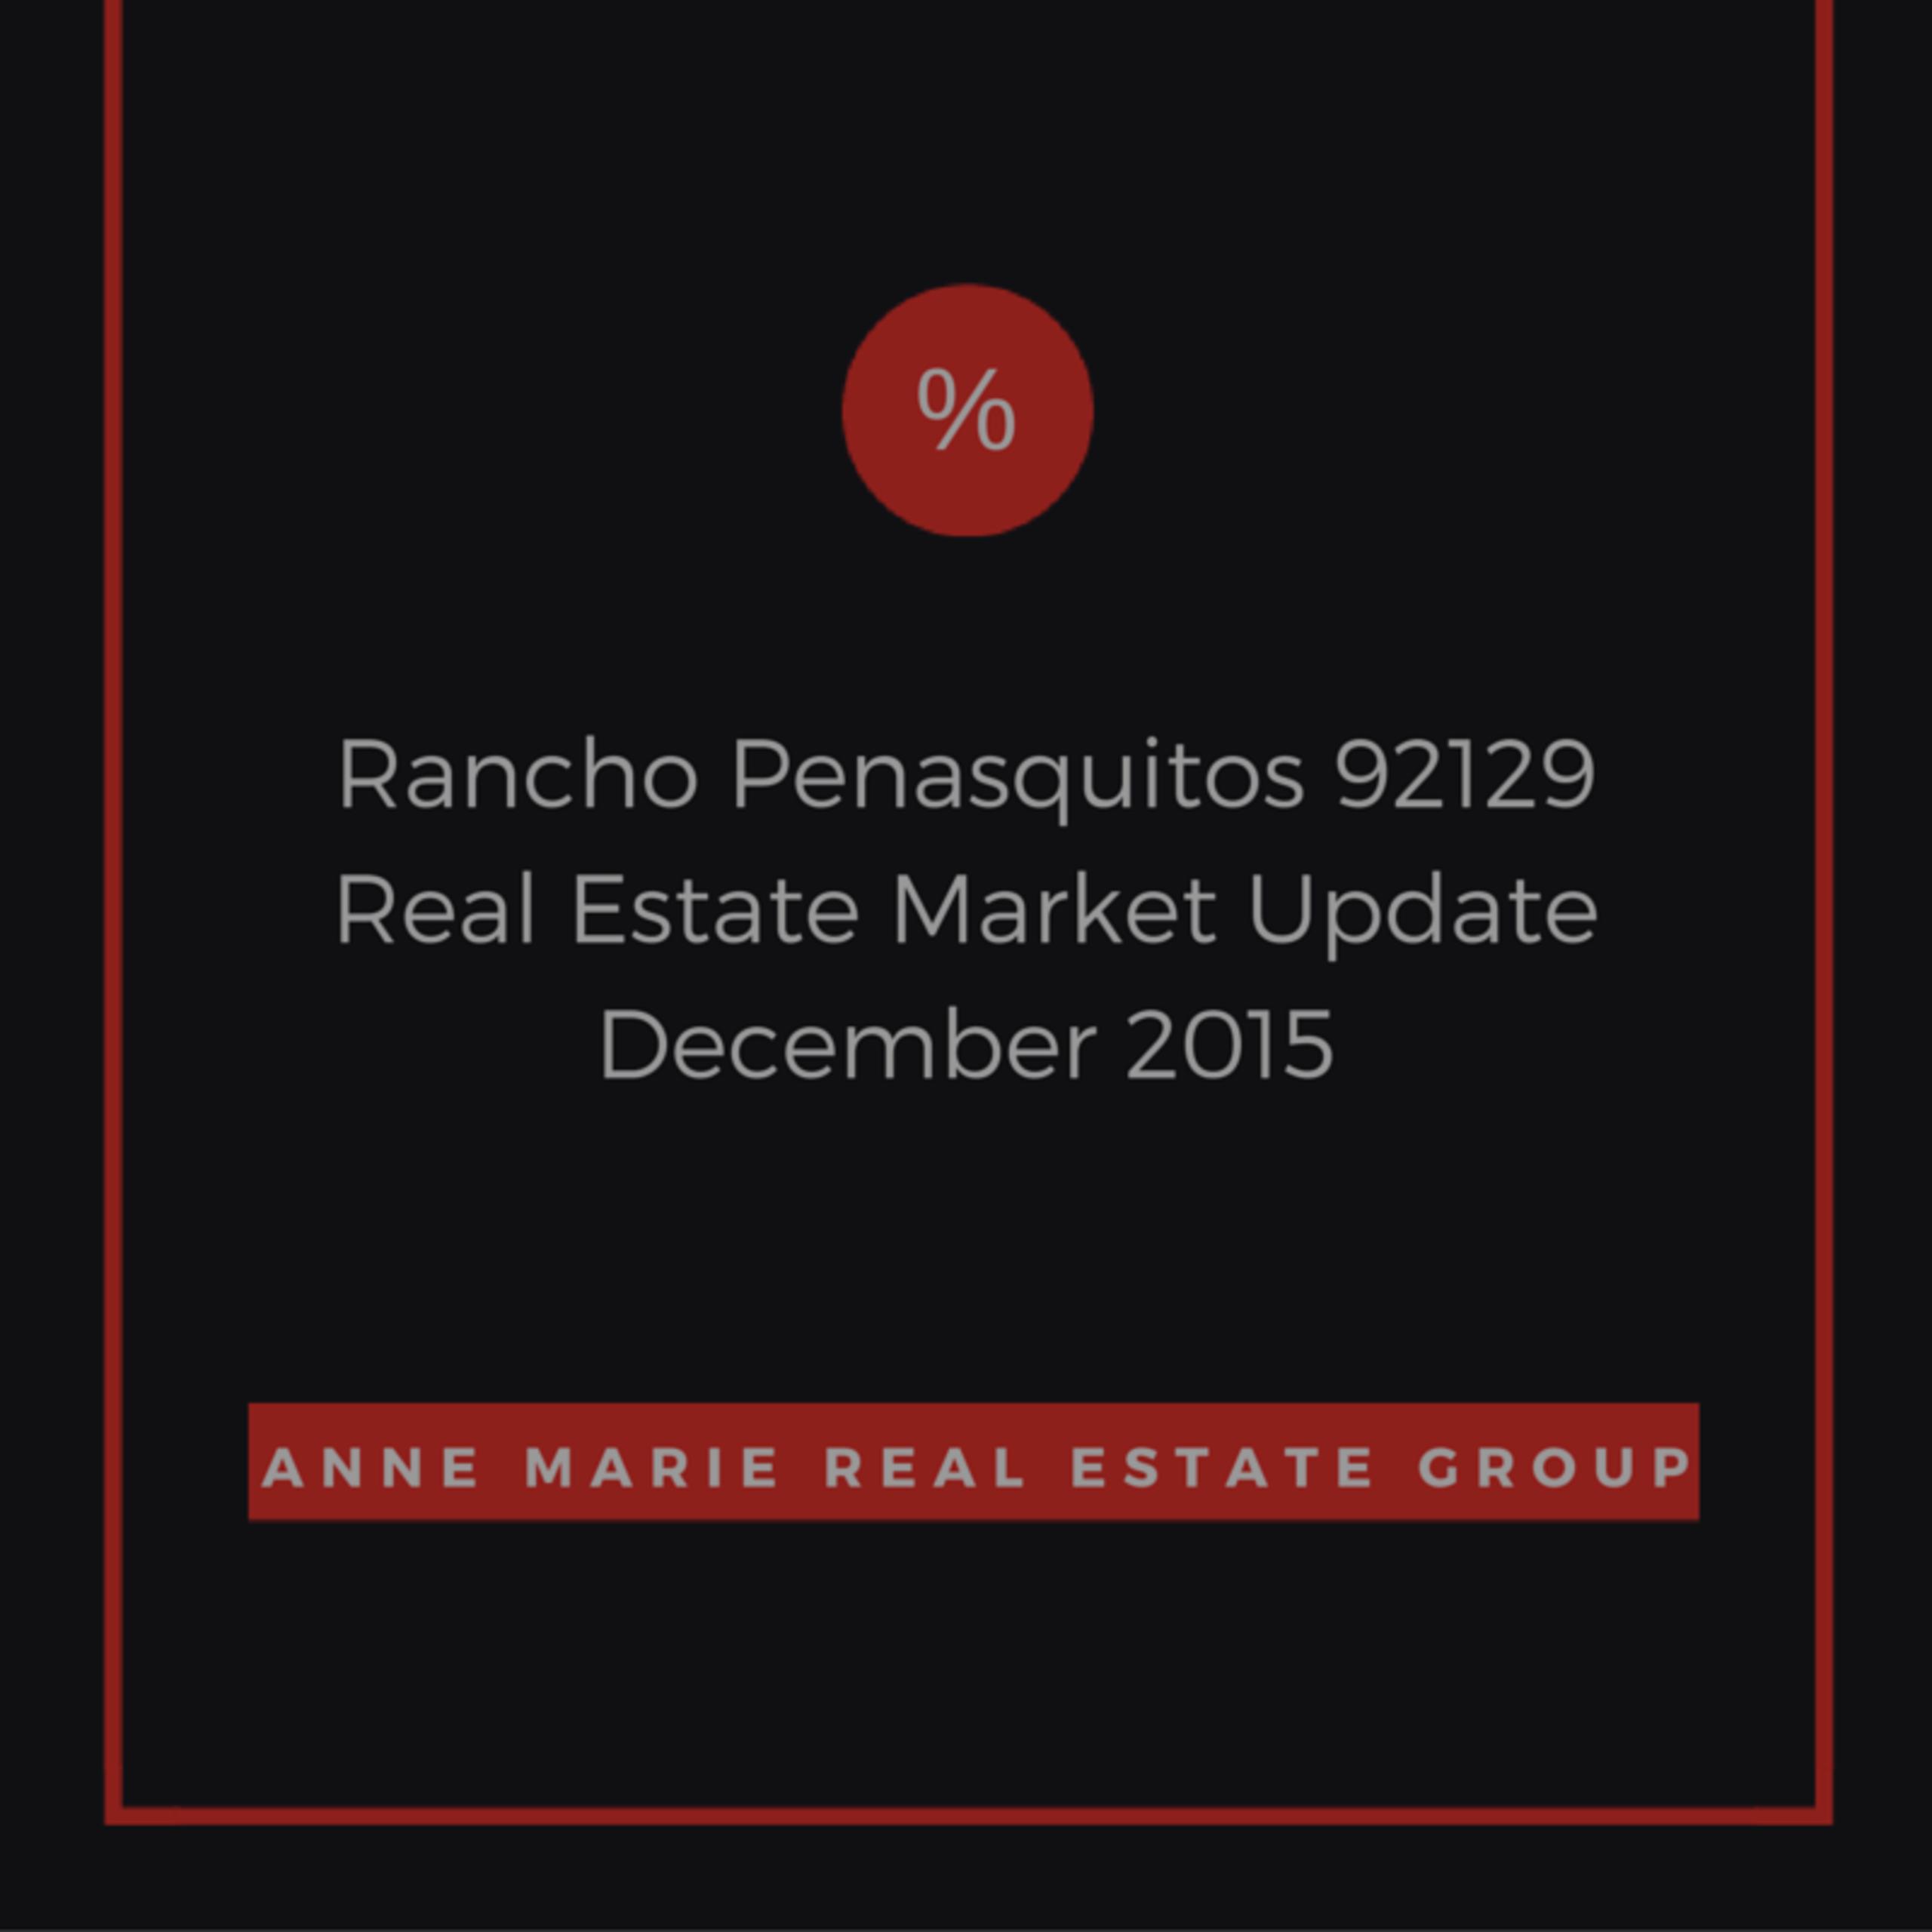 Rancho Penasquitos 92129 Dec 2015 Market Update